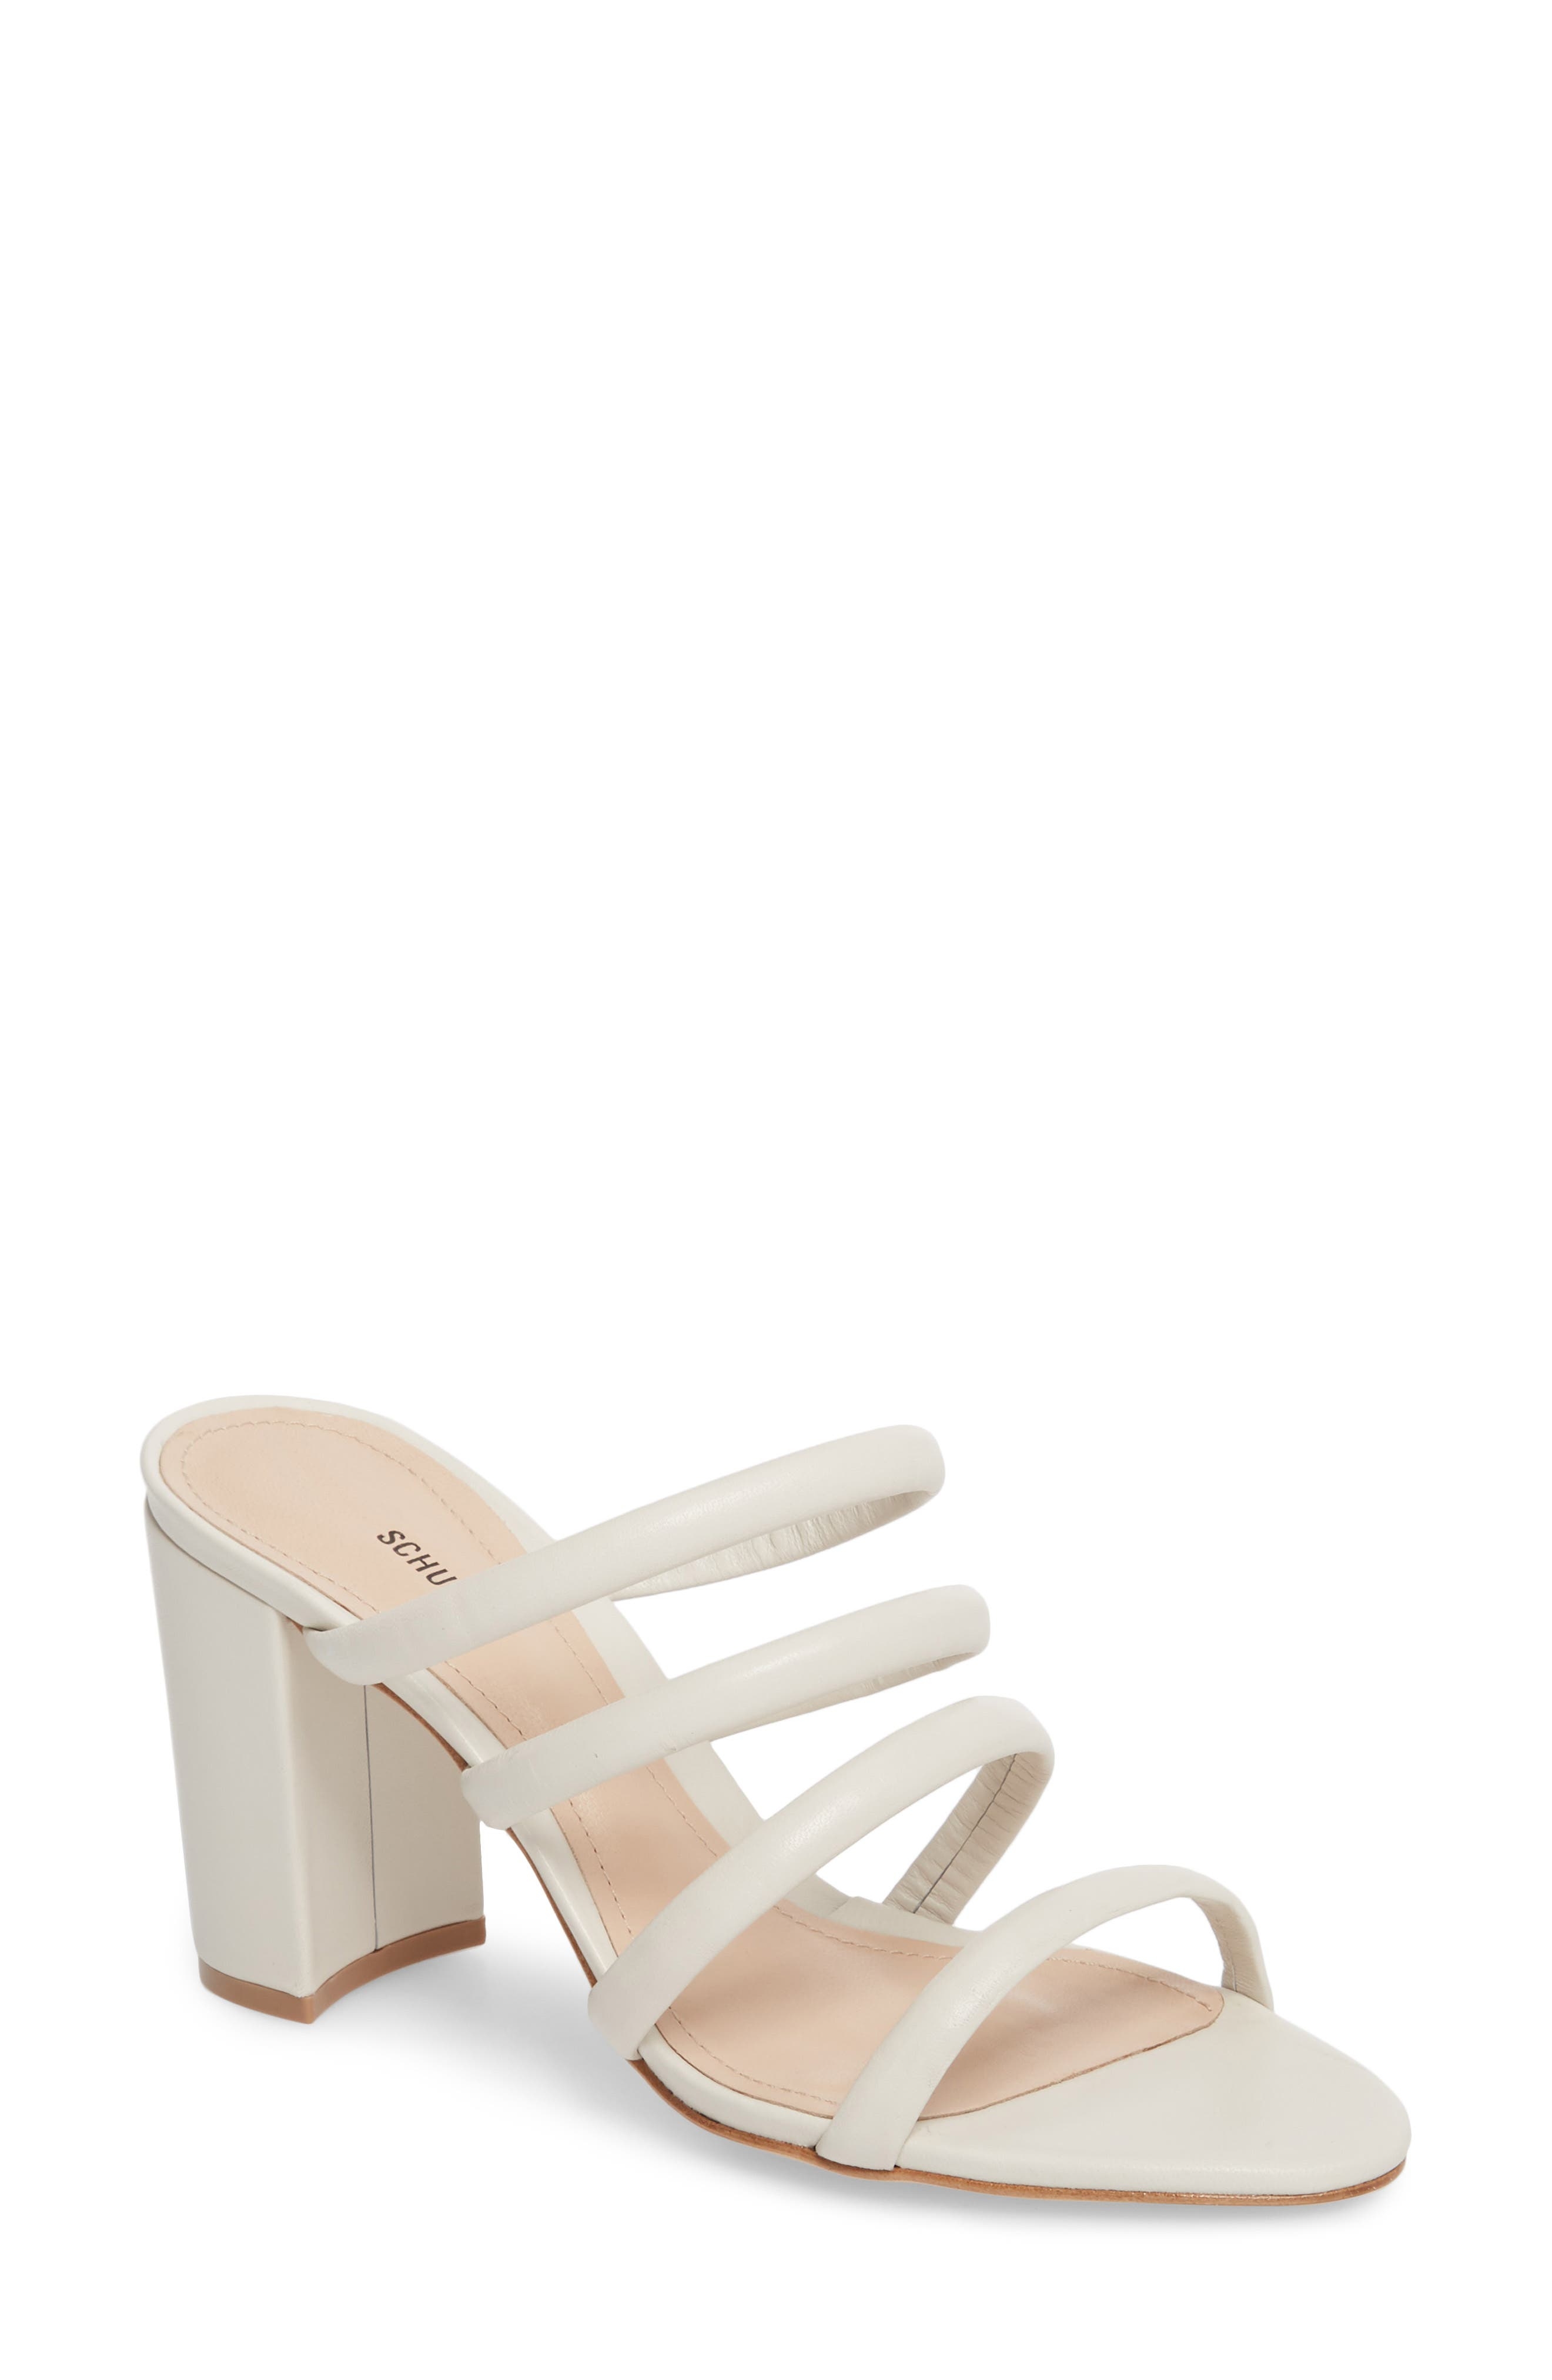 Felisa Block Heel Sandal,                             Main thumbnail 1, color,                             Pearl Leather